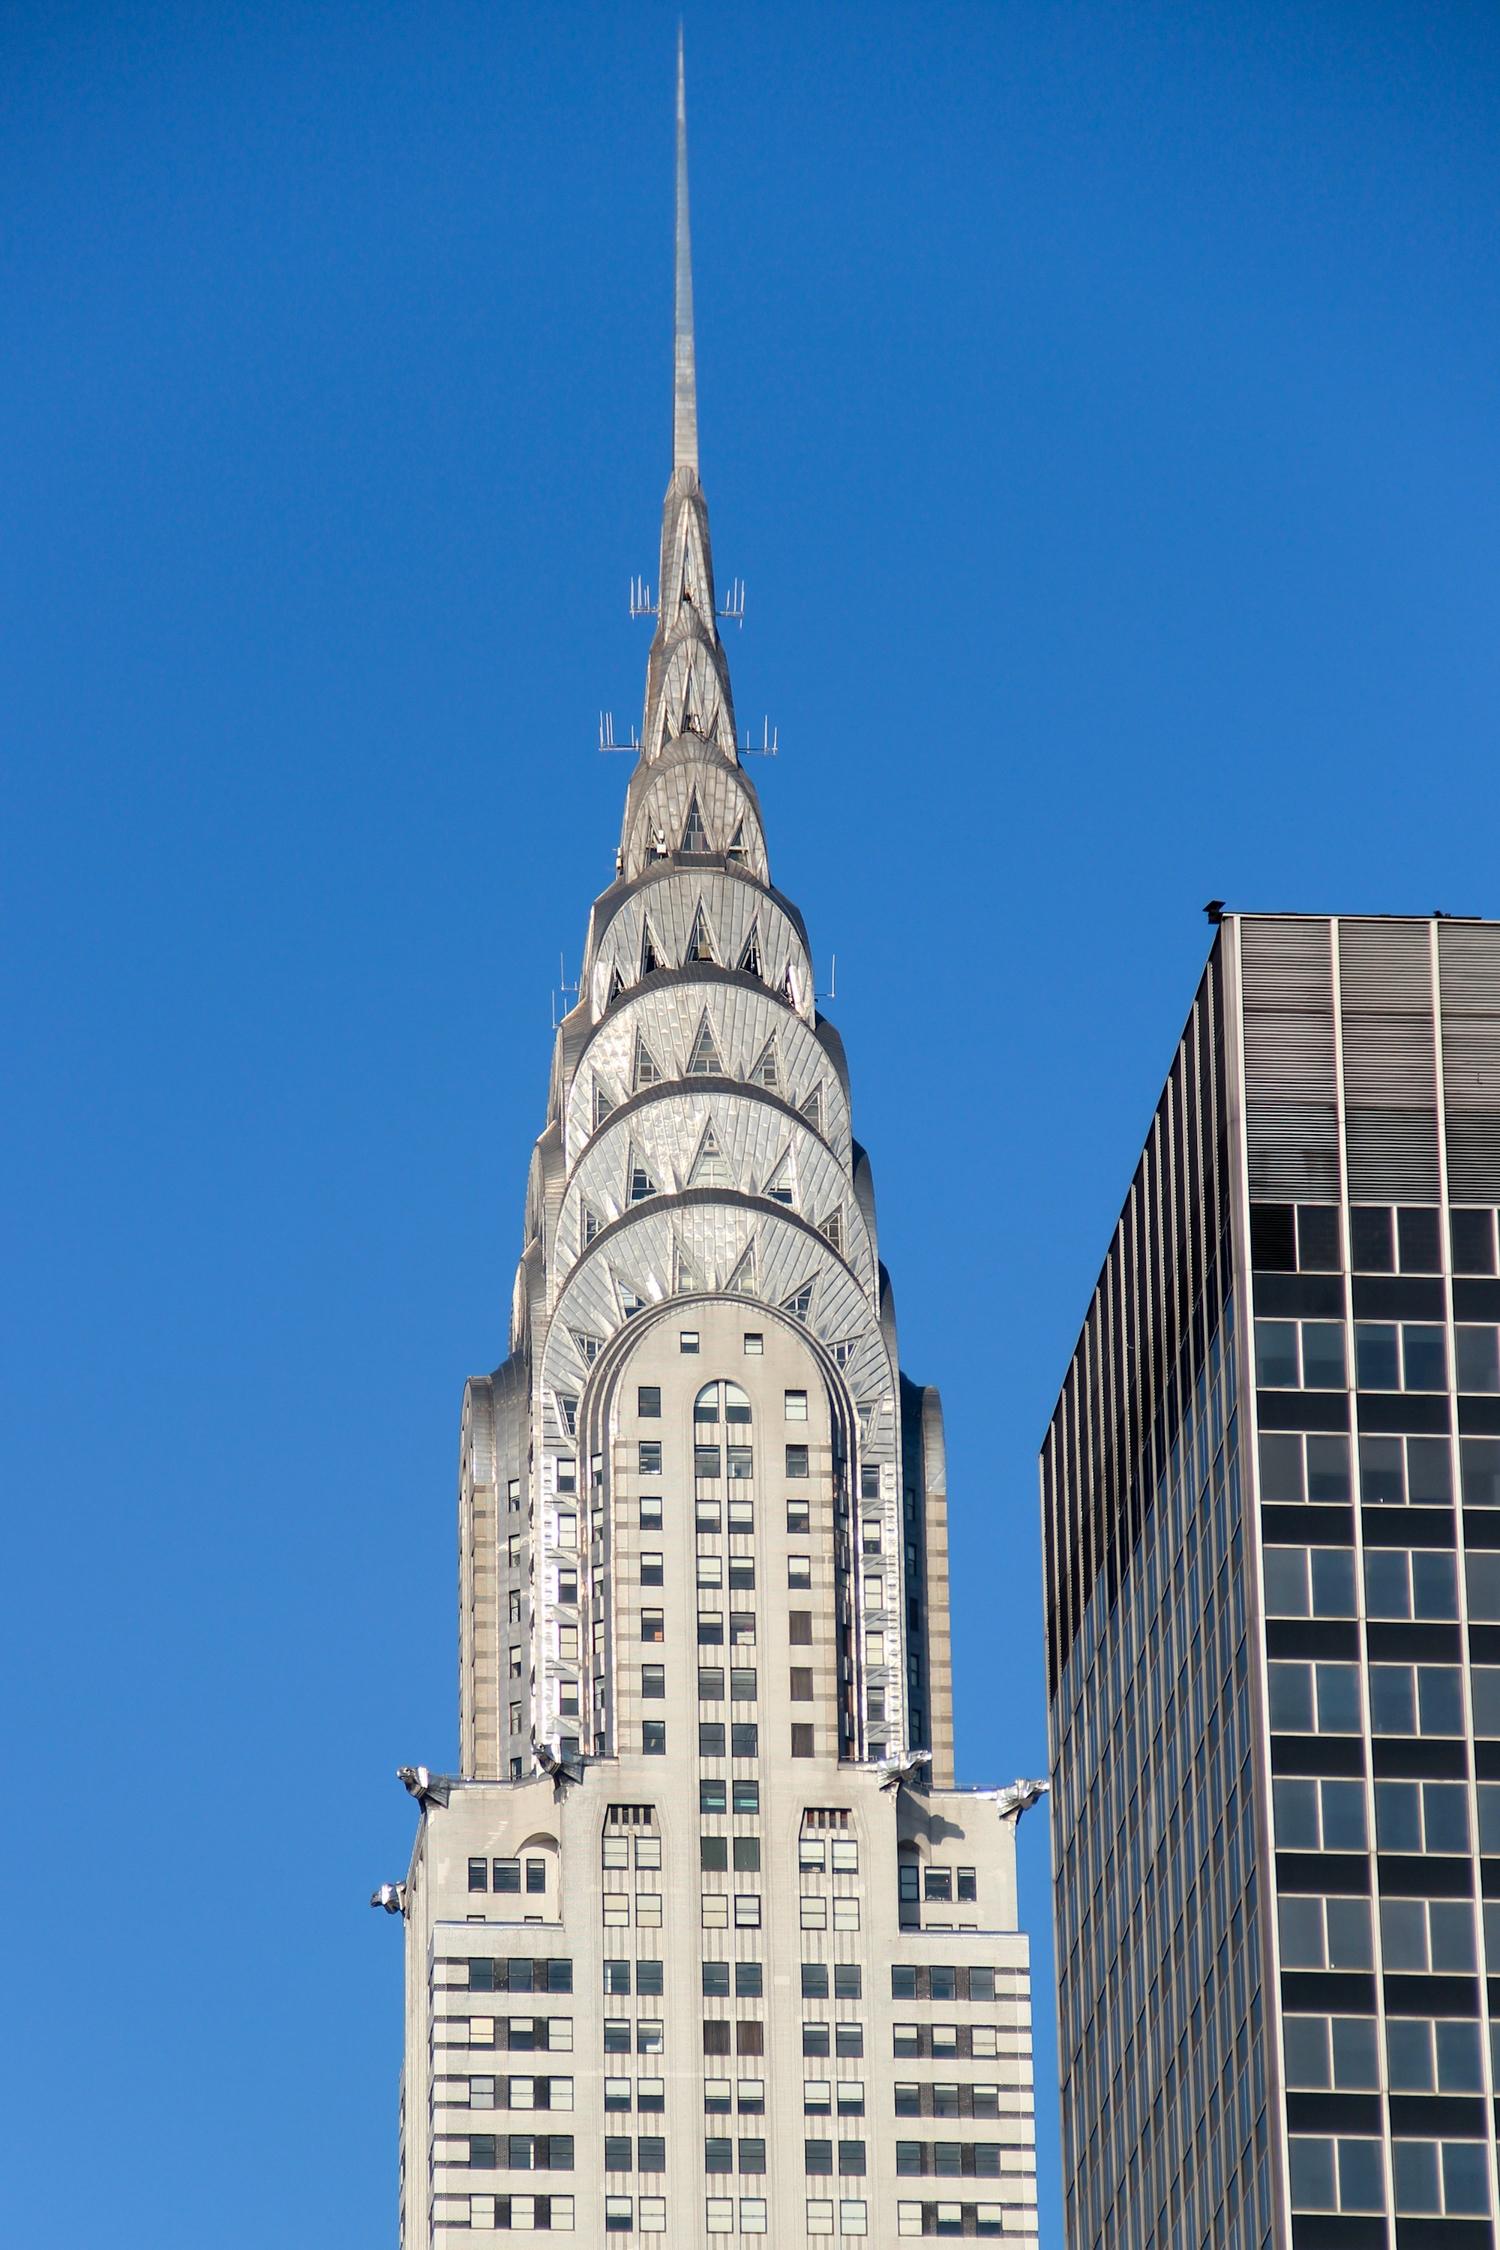 images of new york city in the winter designedbynatalie design photography. Black Bedroom Furniture Sets. Home Design Ideas